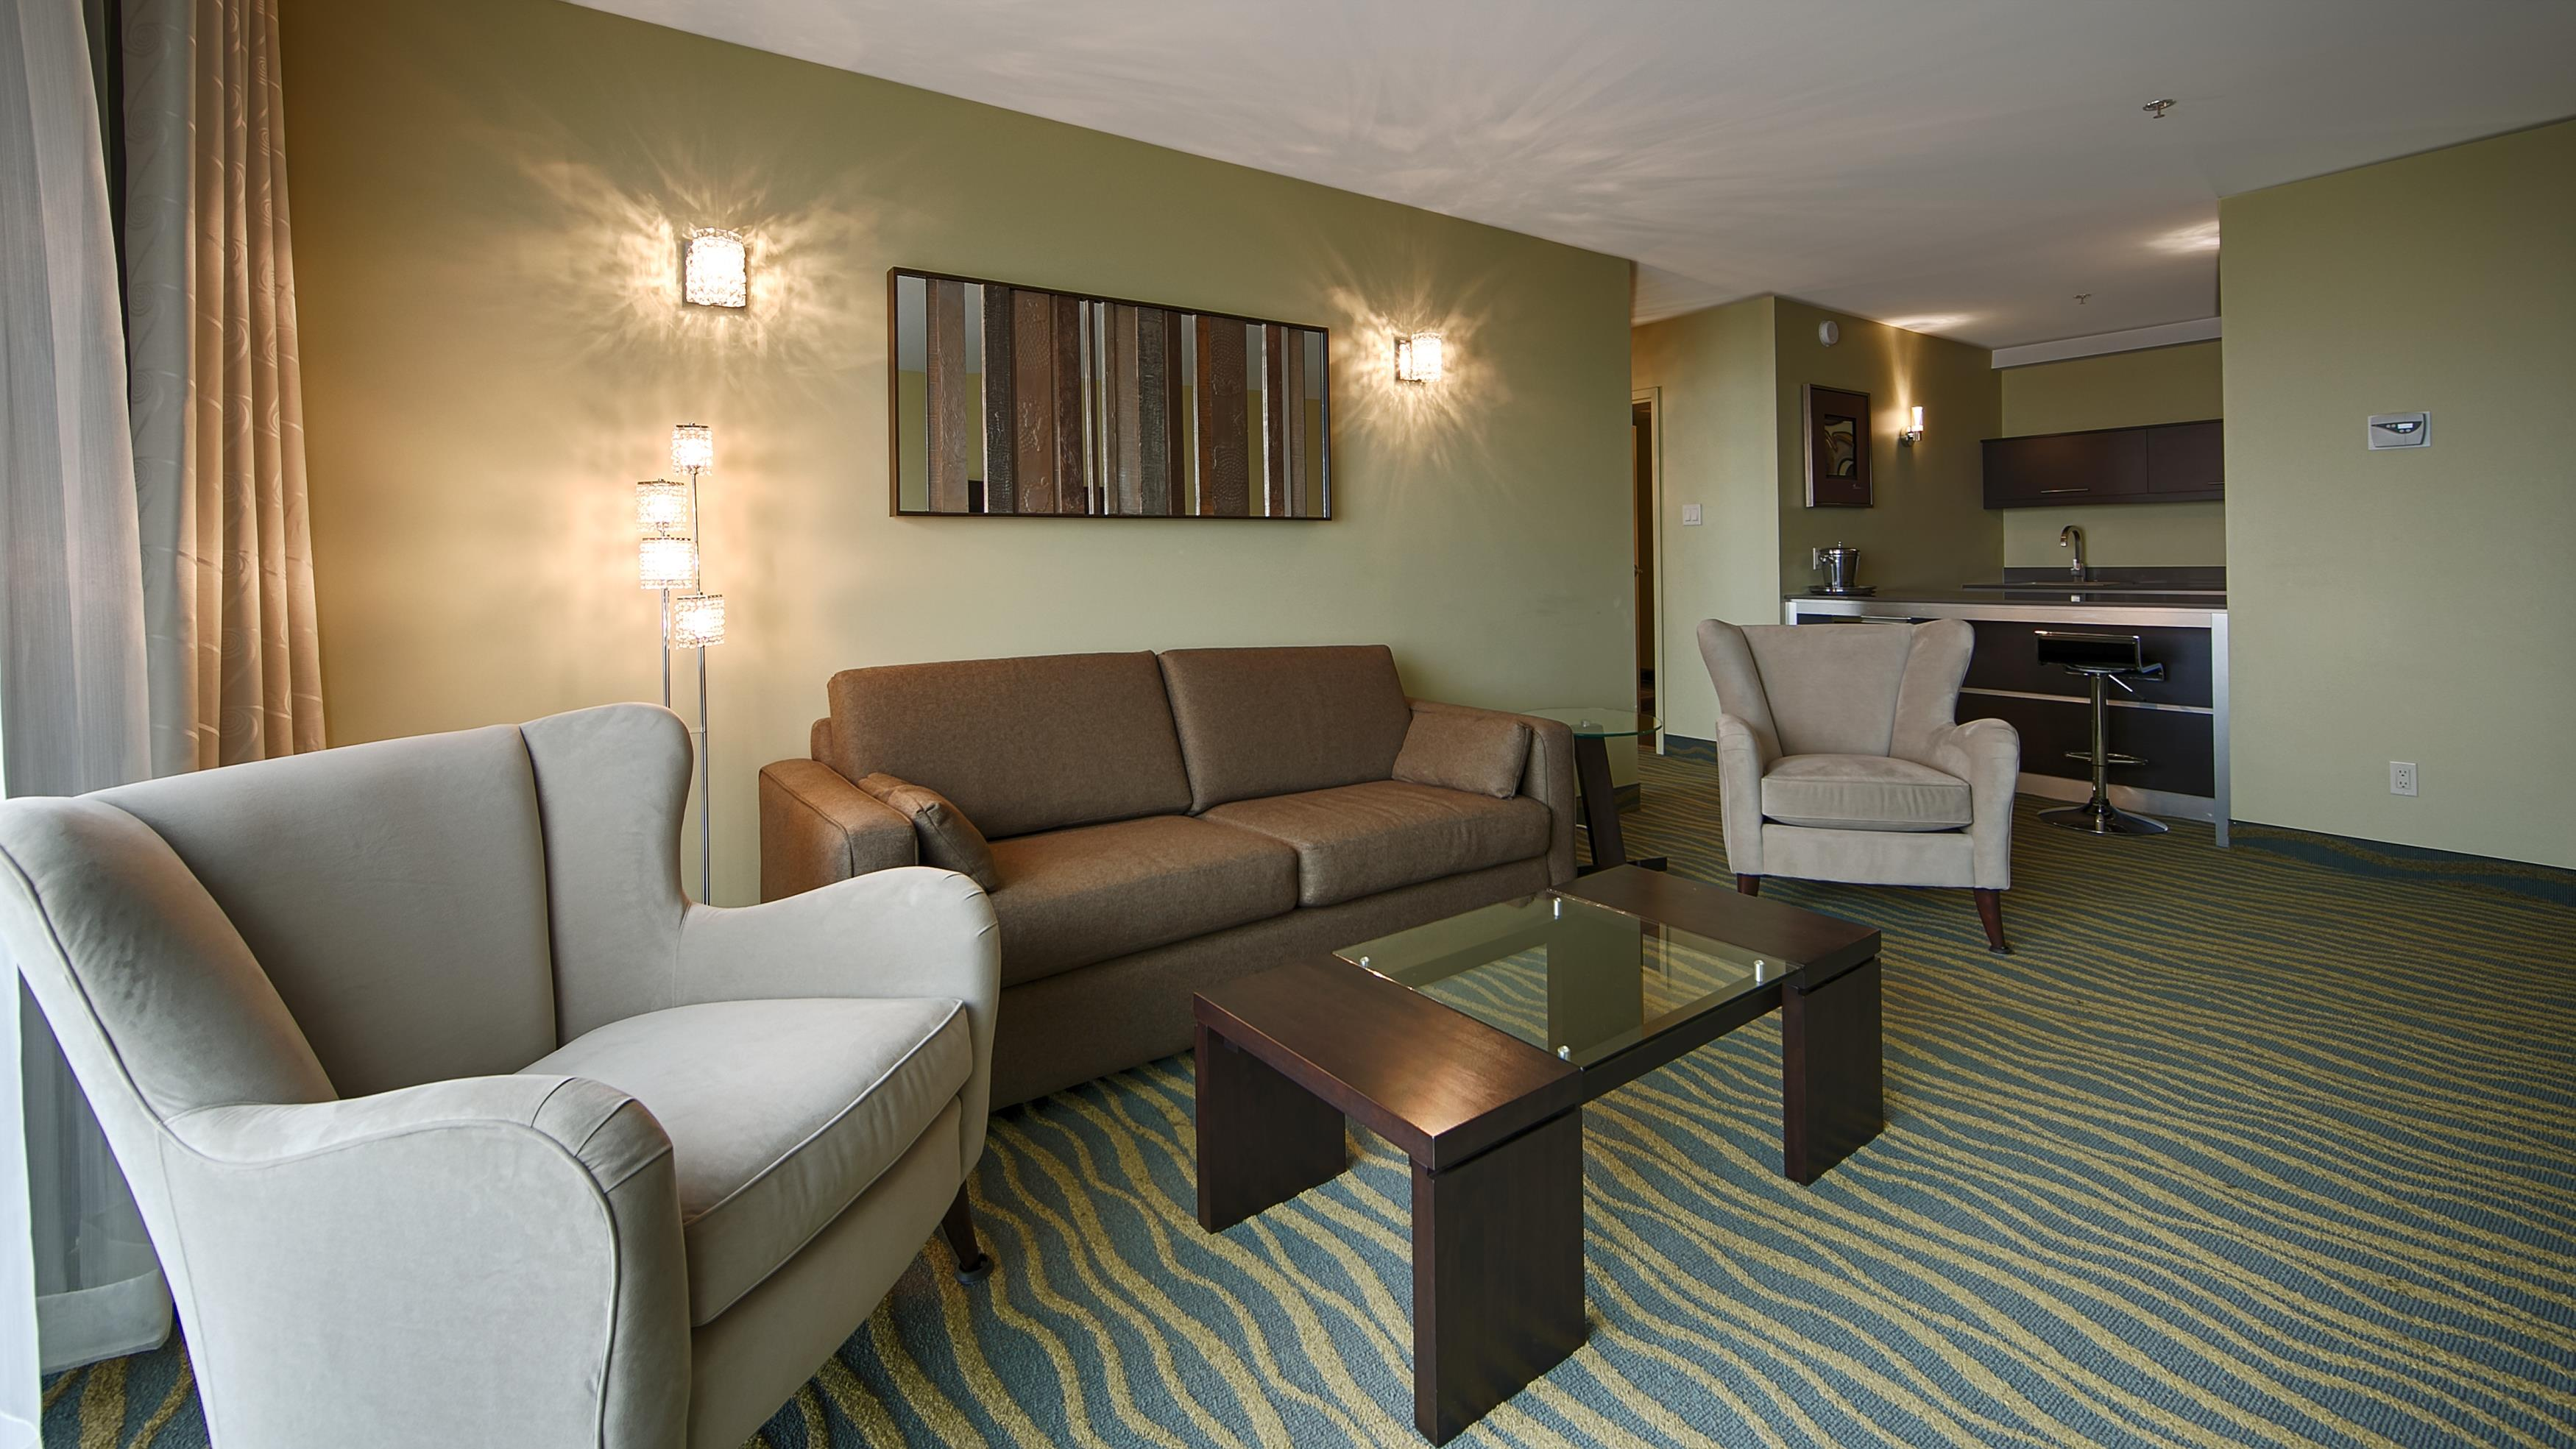 Best Western Plus Hotel Levesque à Riviere-du-Loup: Signature King Suite with River View